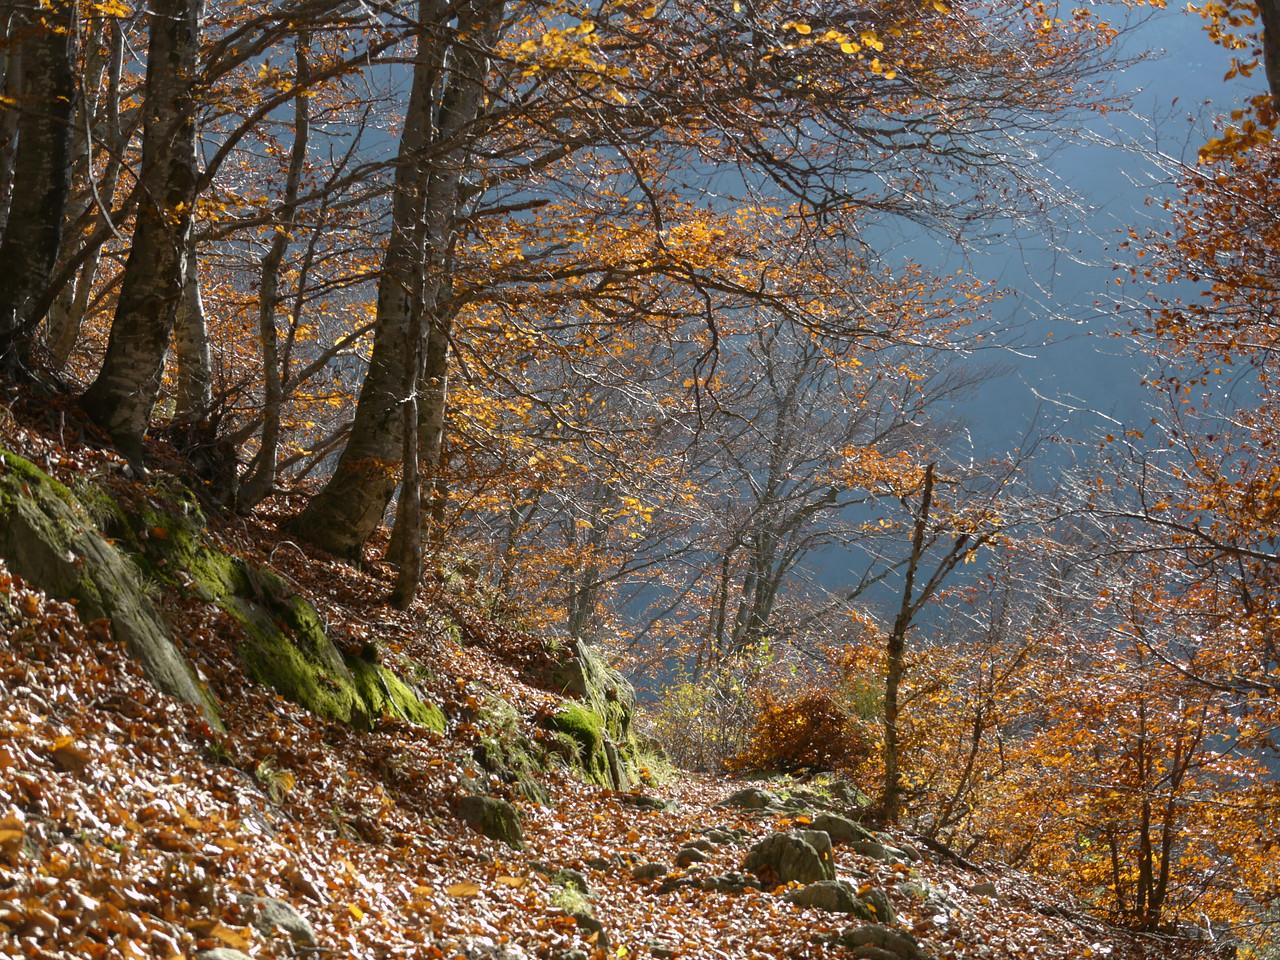 @RobAng 2012,  Rasa, Rasa, Cantone Ticino, CHE, Schweiz, 1010 m ü/M, 15.11.2012 12:55:35